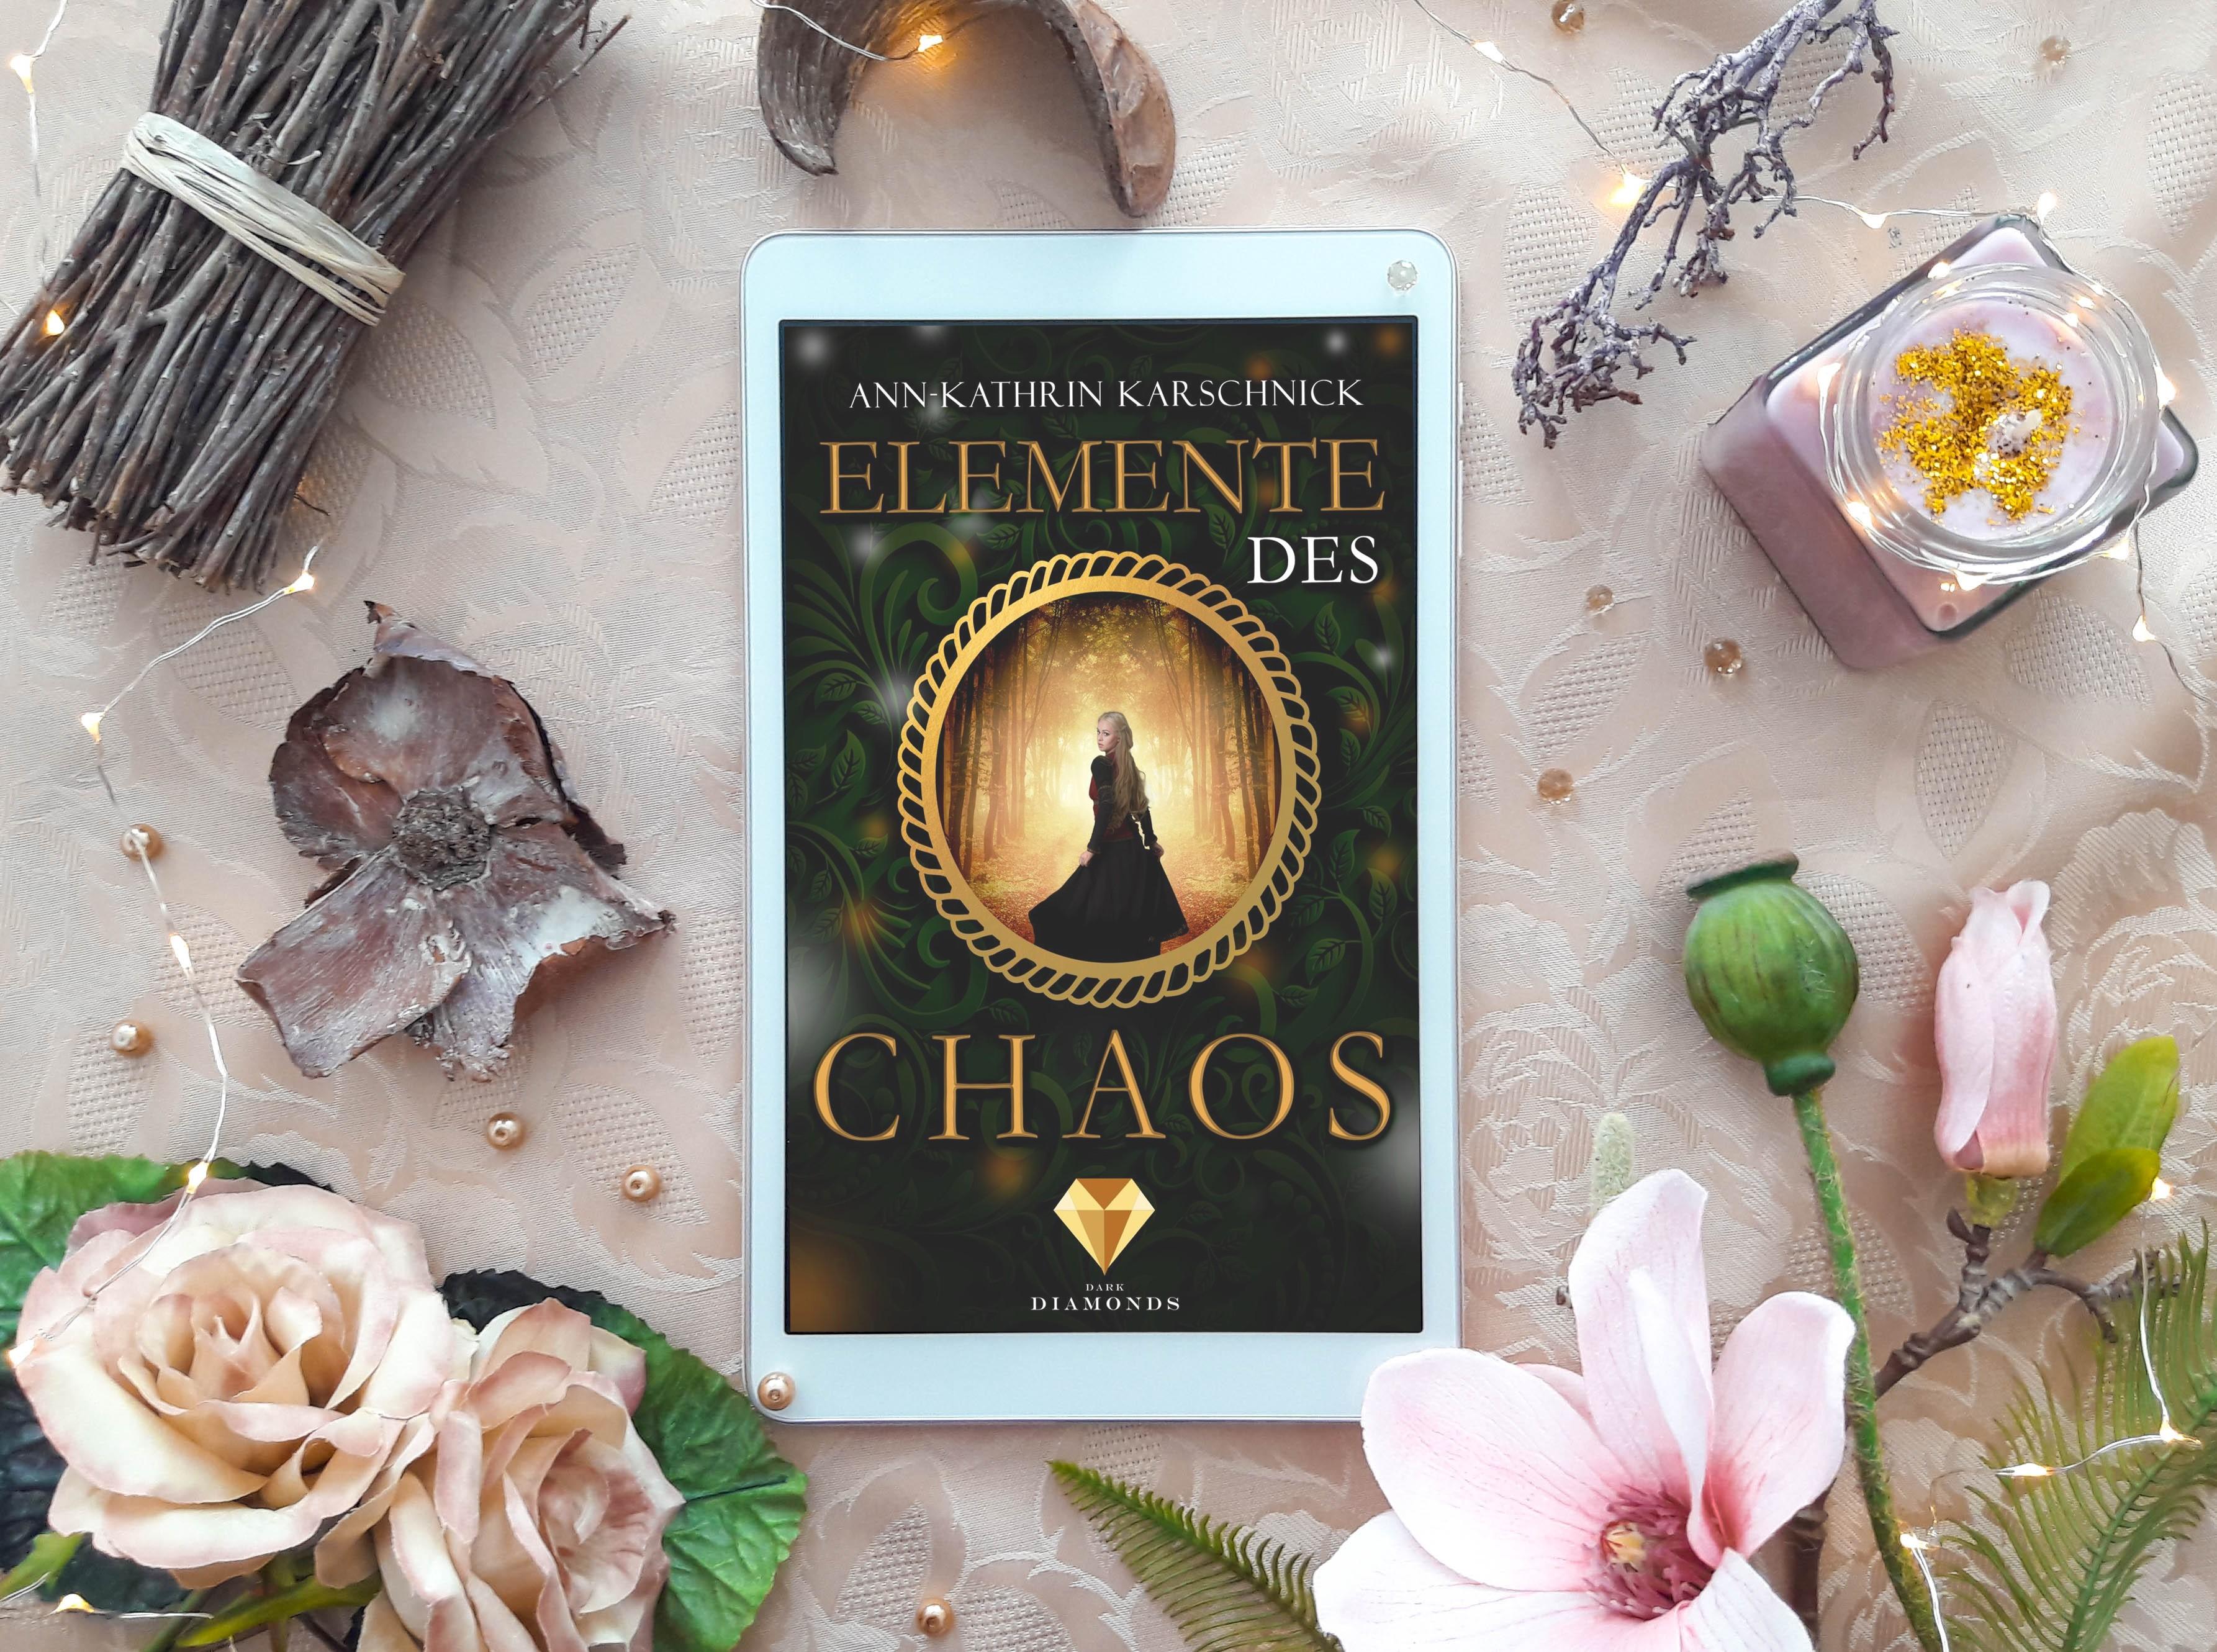 Elemente des Chaos – Ann-Kathrin Karschnick graphic